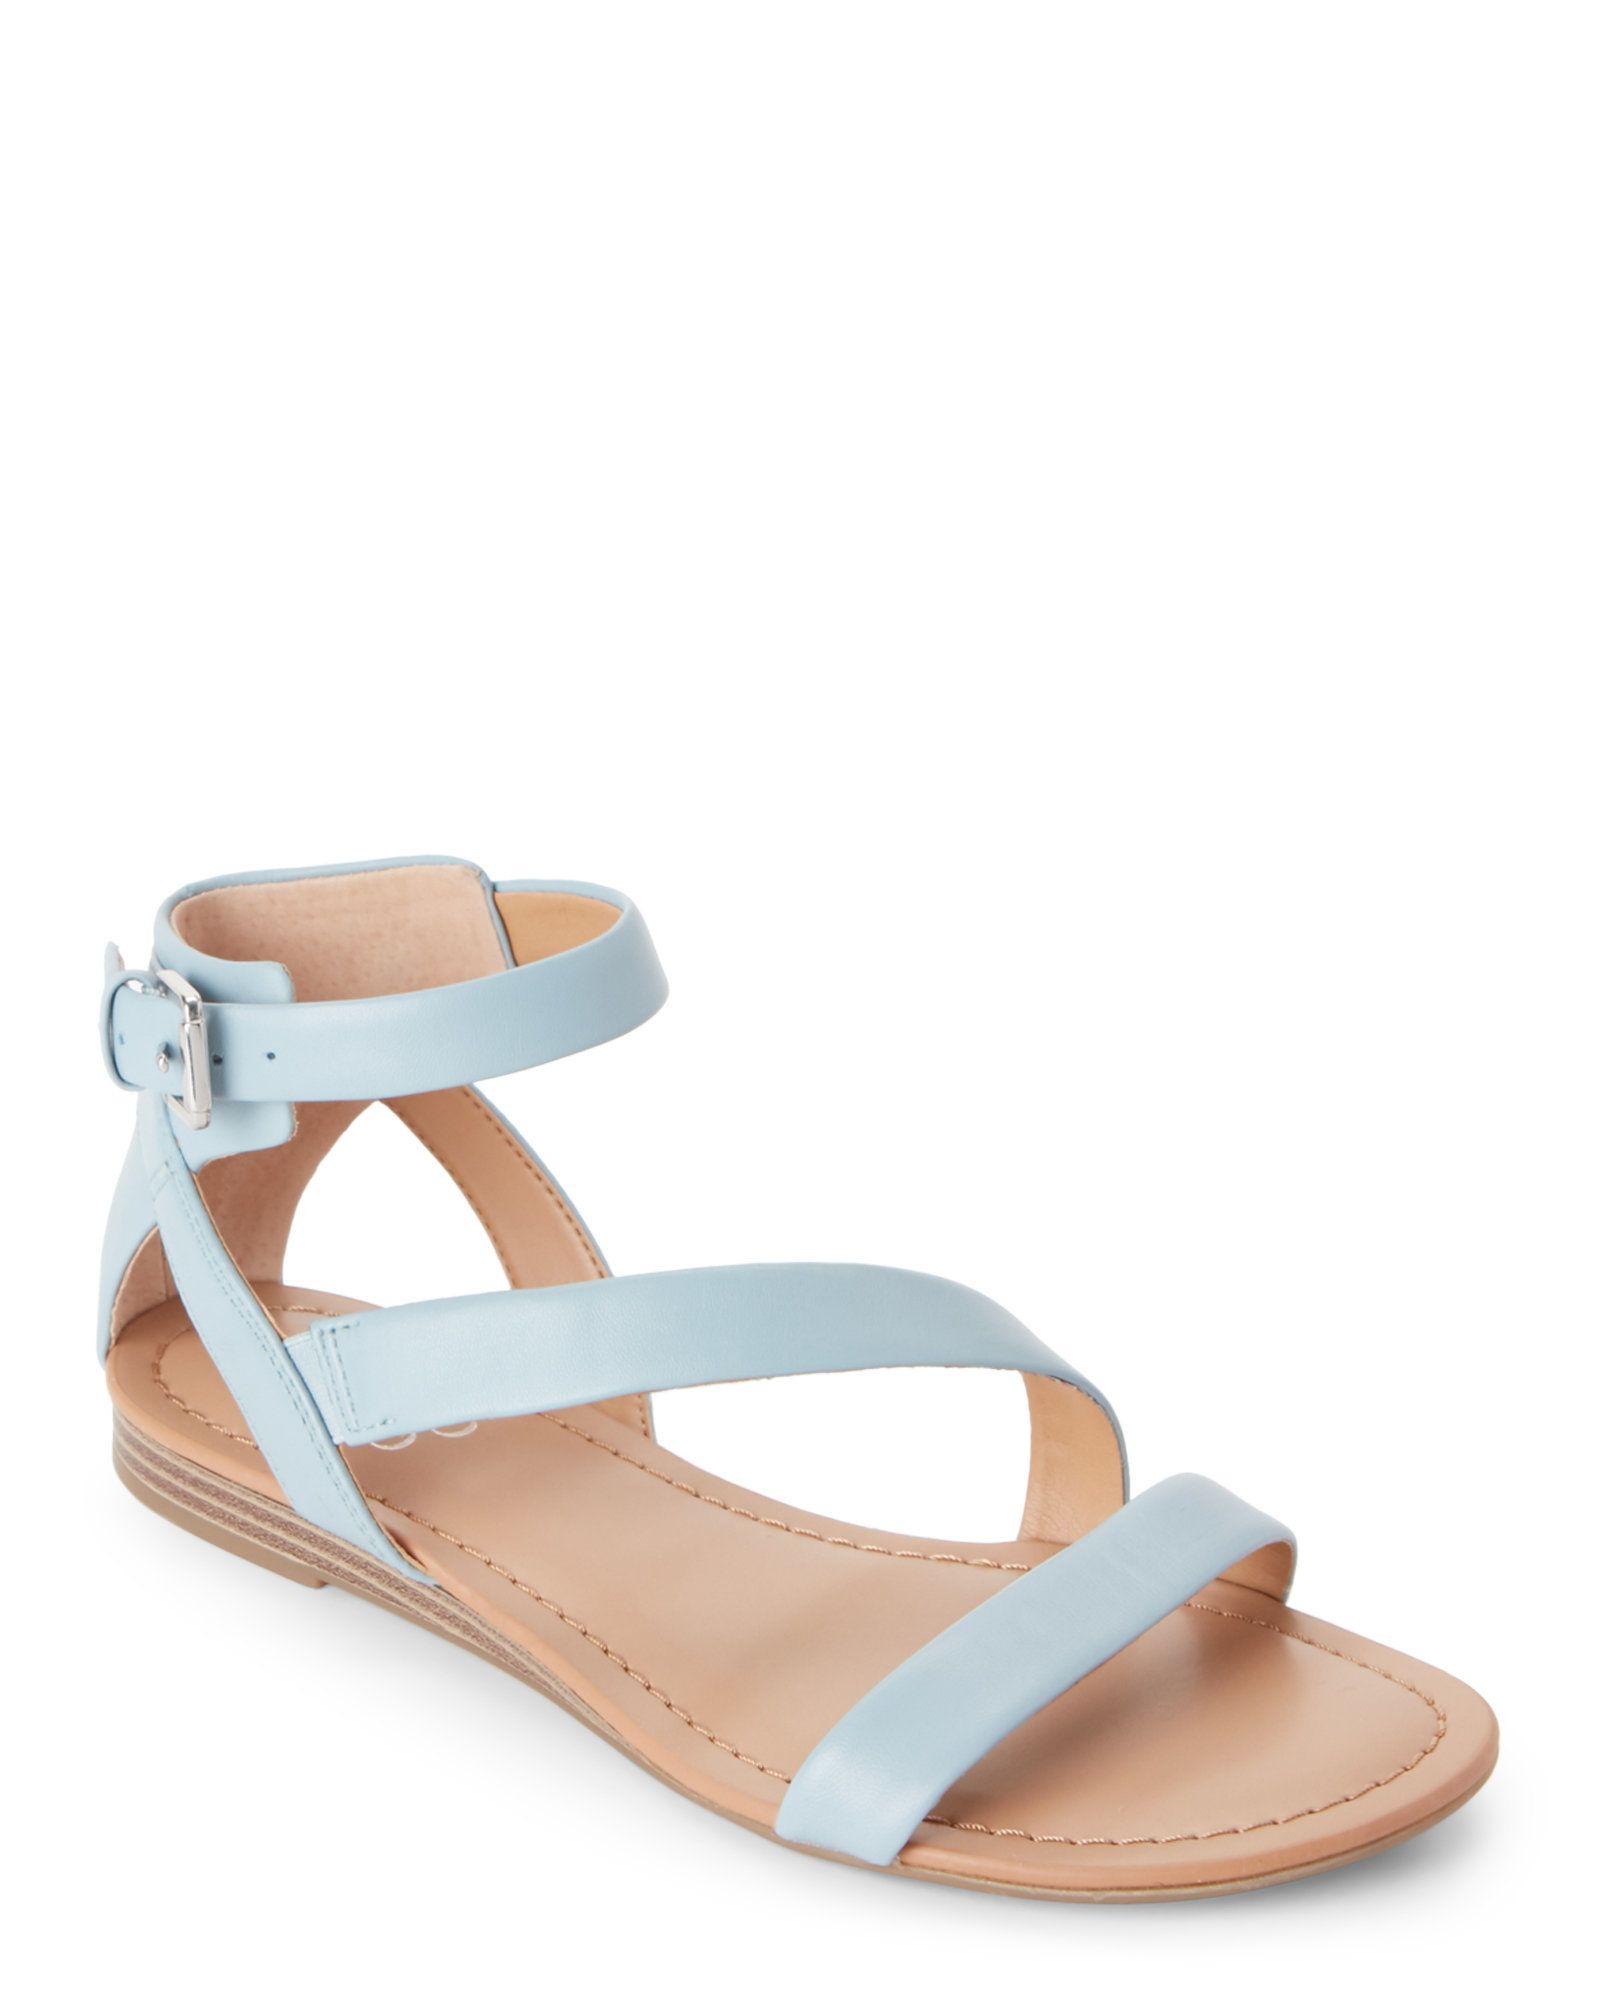 a778bb9e03a239 Franco Sarto Pale Blue Gracia Demi Wedge Gladiator Sandals